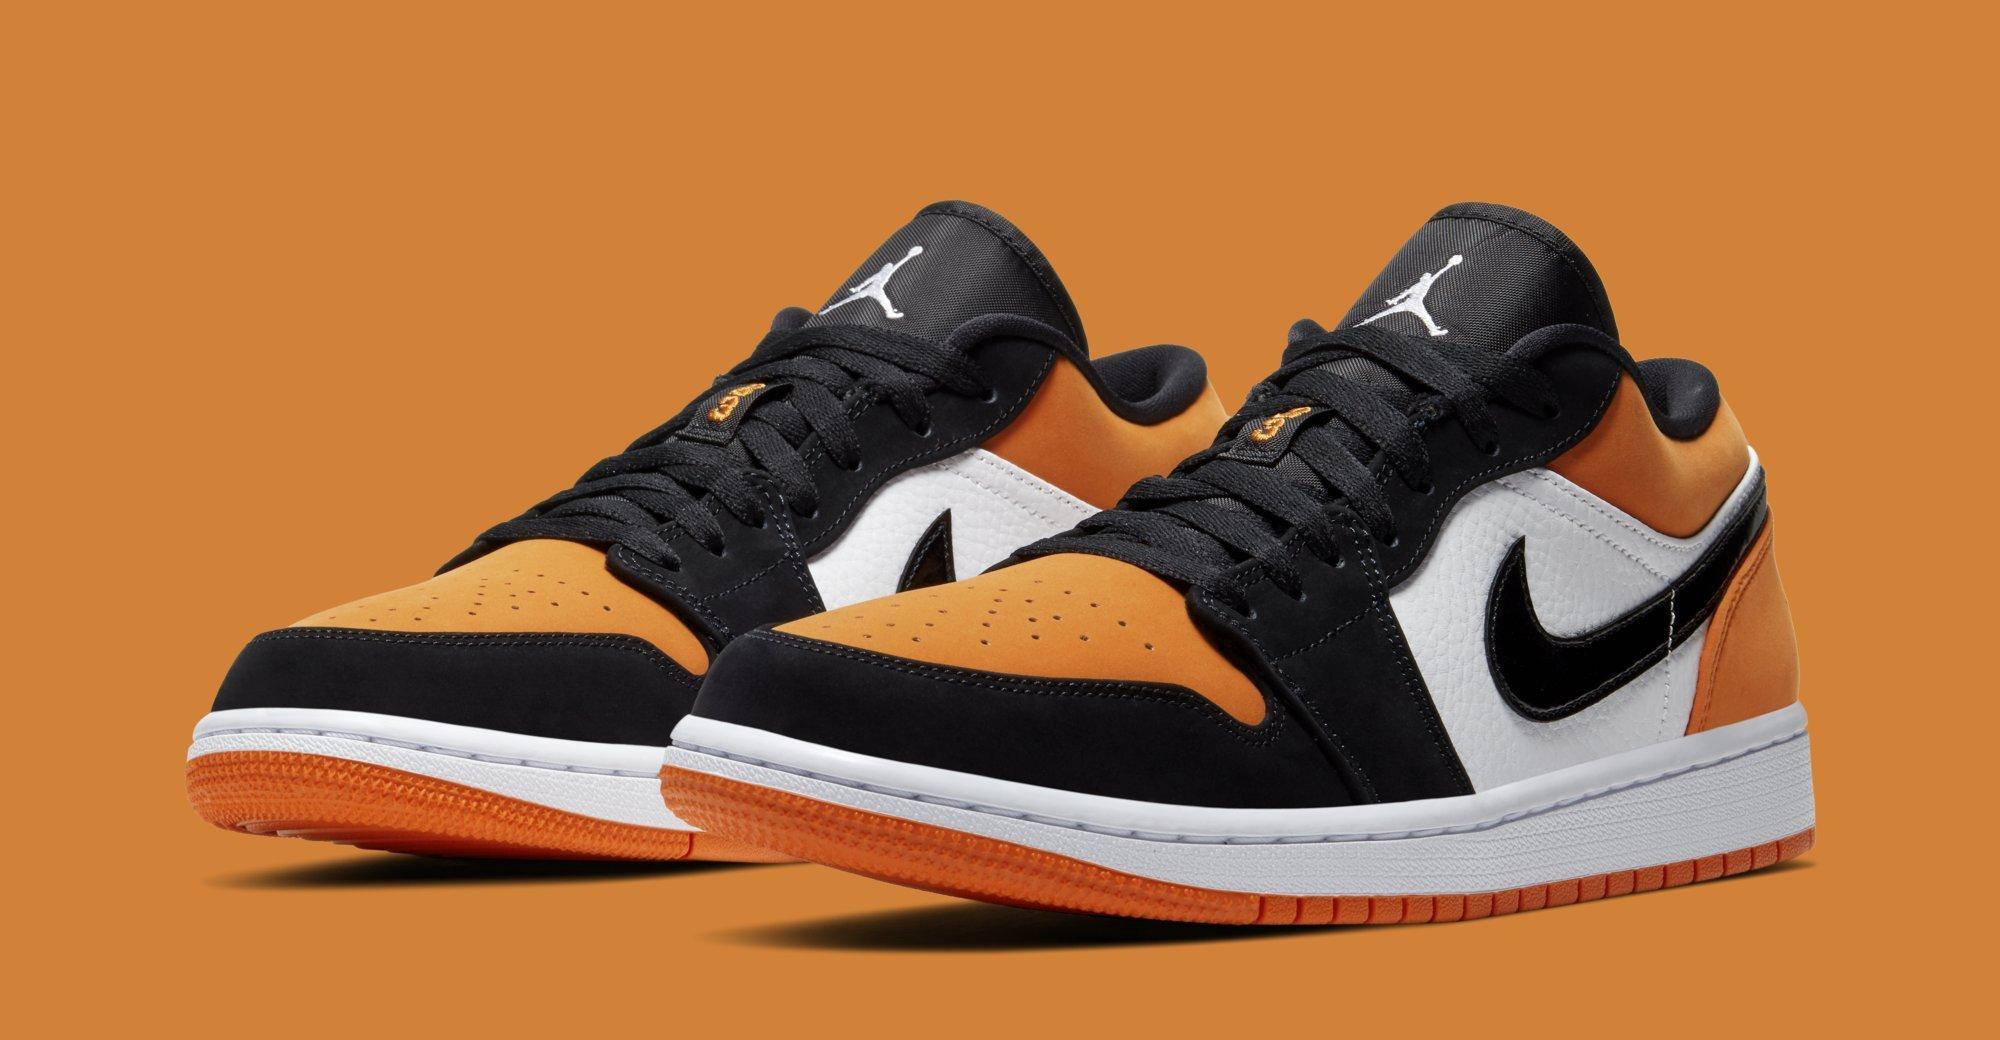 Air Jordan 1 Low 'Shattered Backboard' Black/White-Starfish 553558 ...